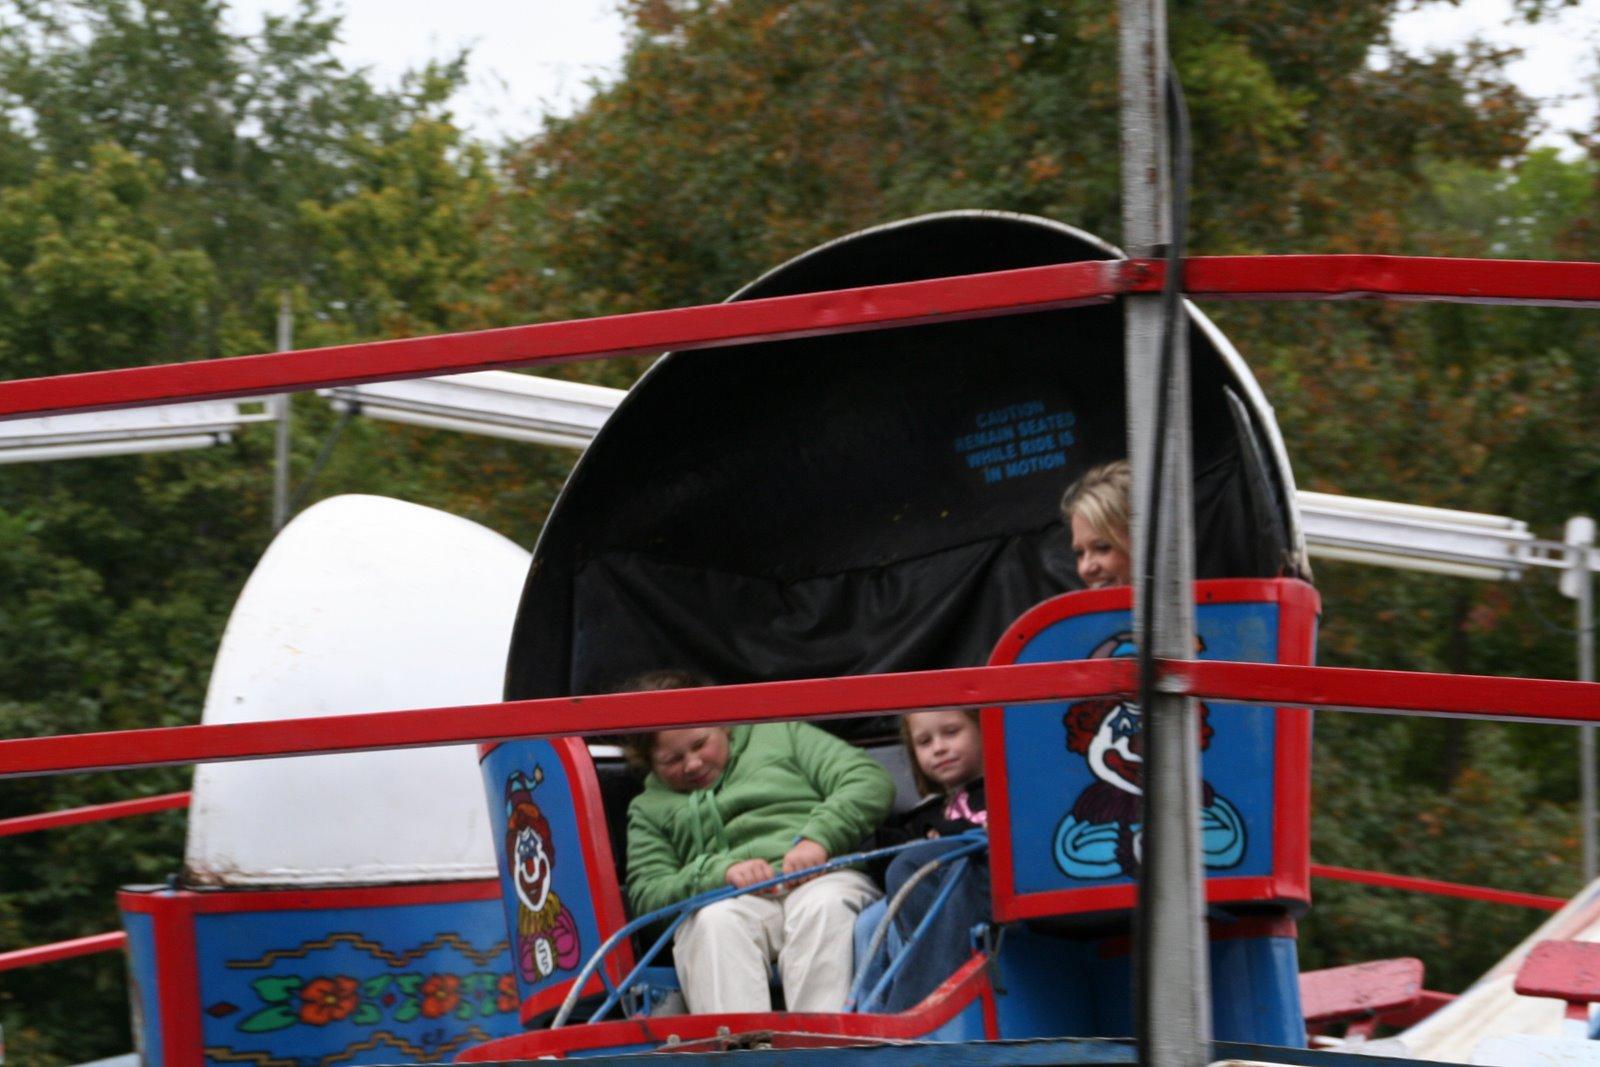 carnival-rides-40